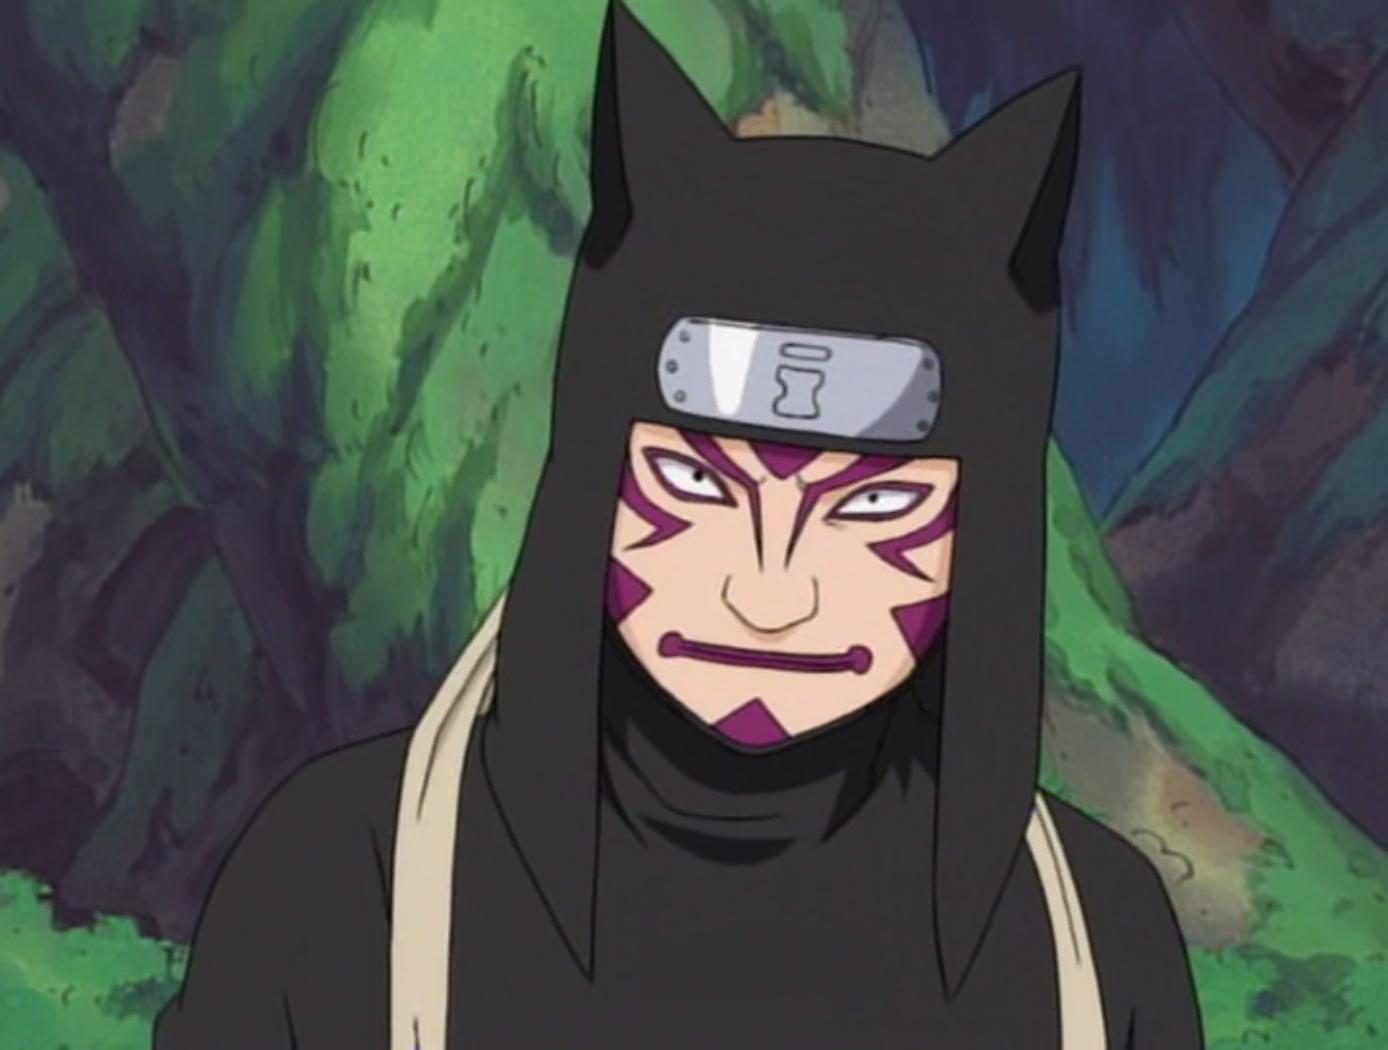 Anime Cat Lady Figuire